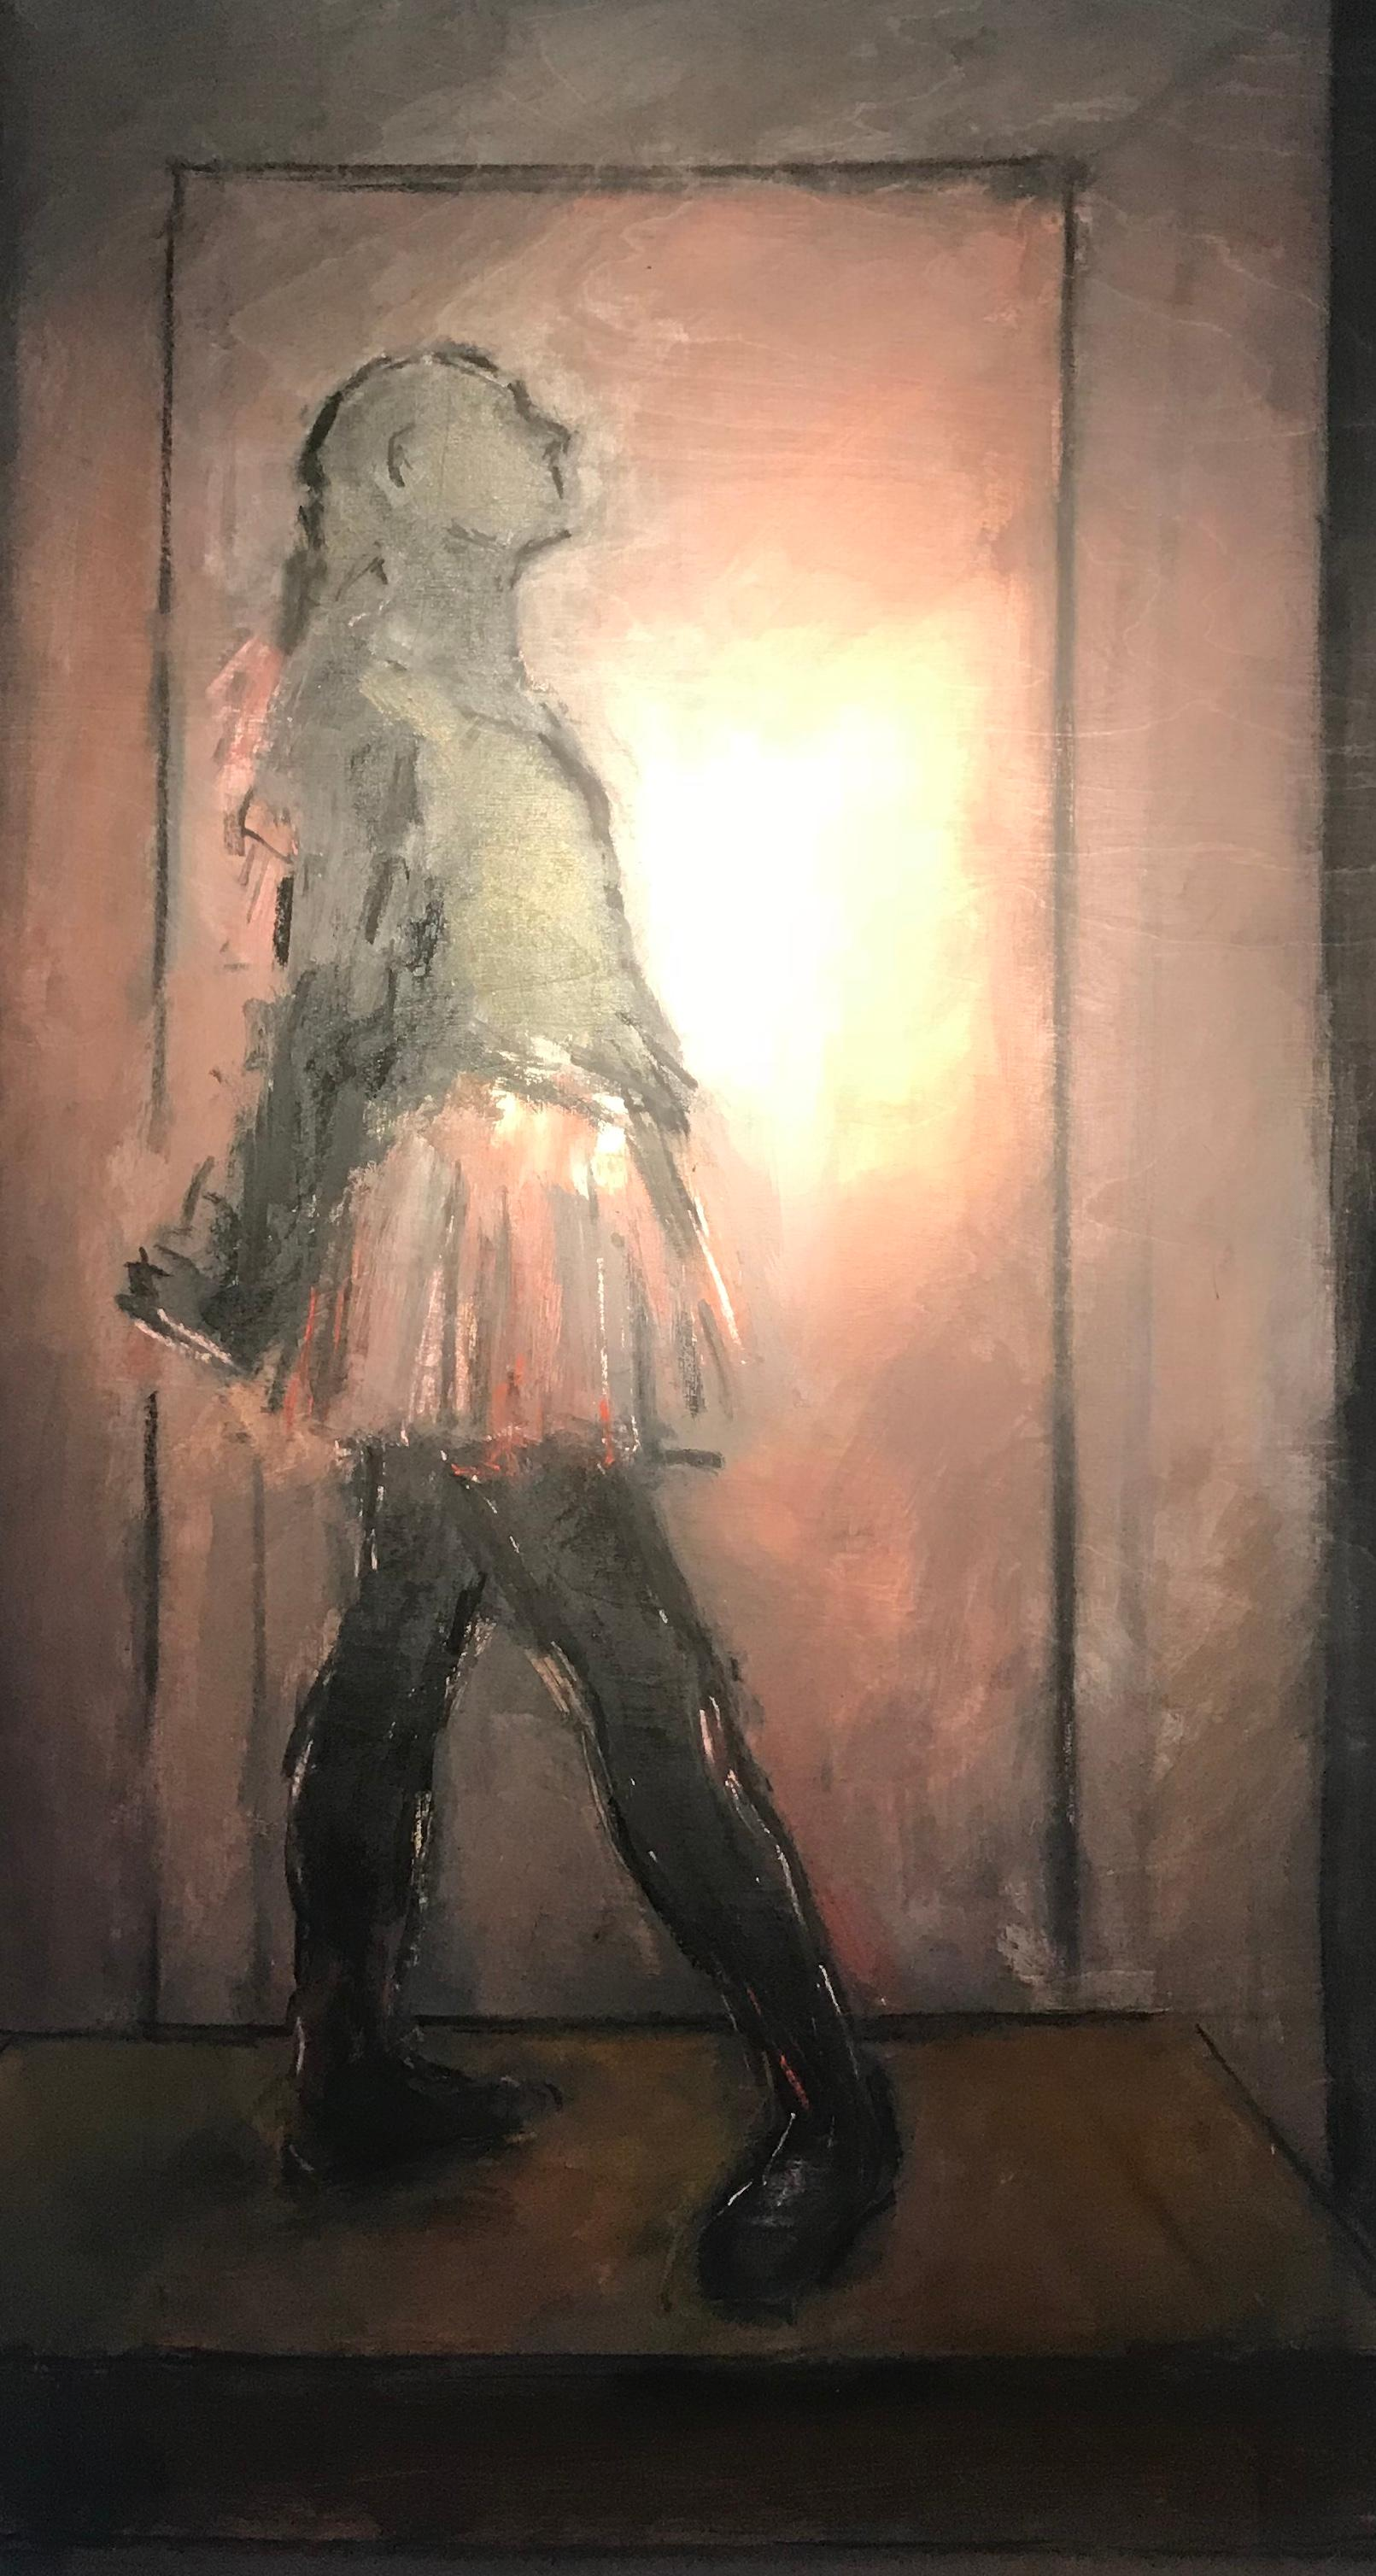 Contemporary Figurative Degas Dancer 'The Little Dancer' Pinks, Blacks & Browns